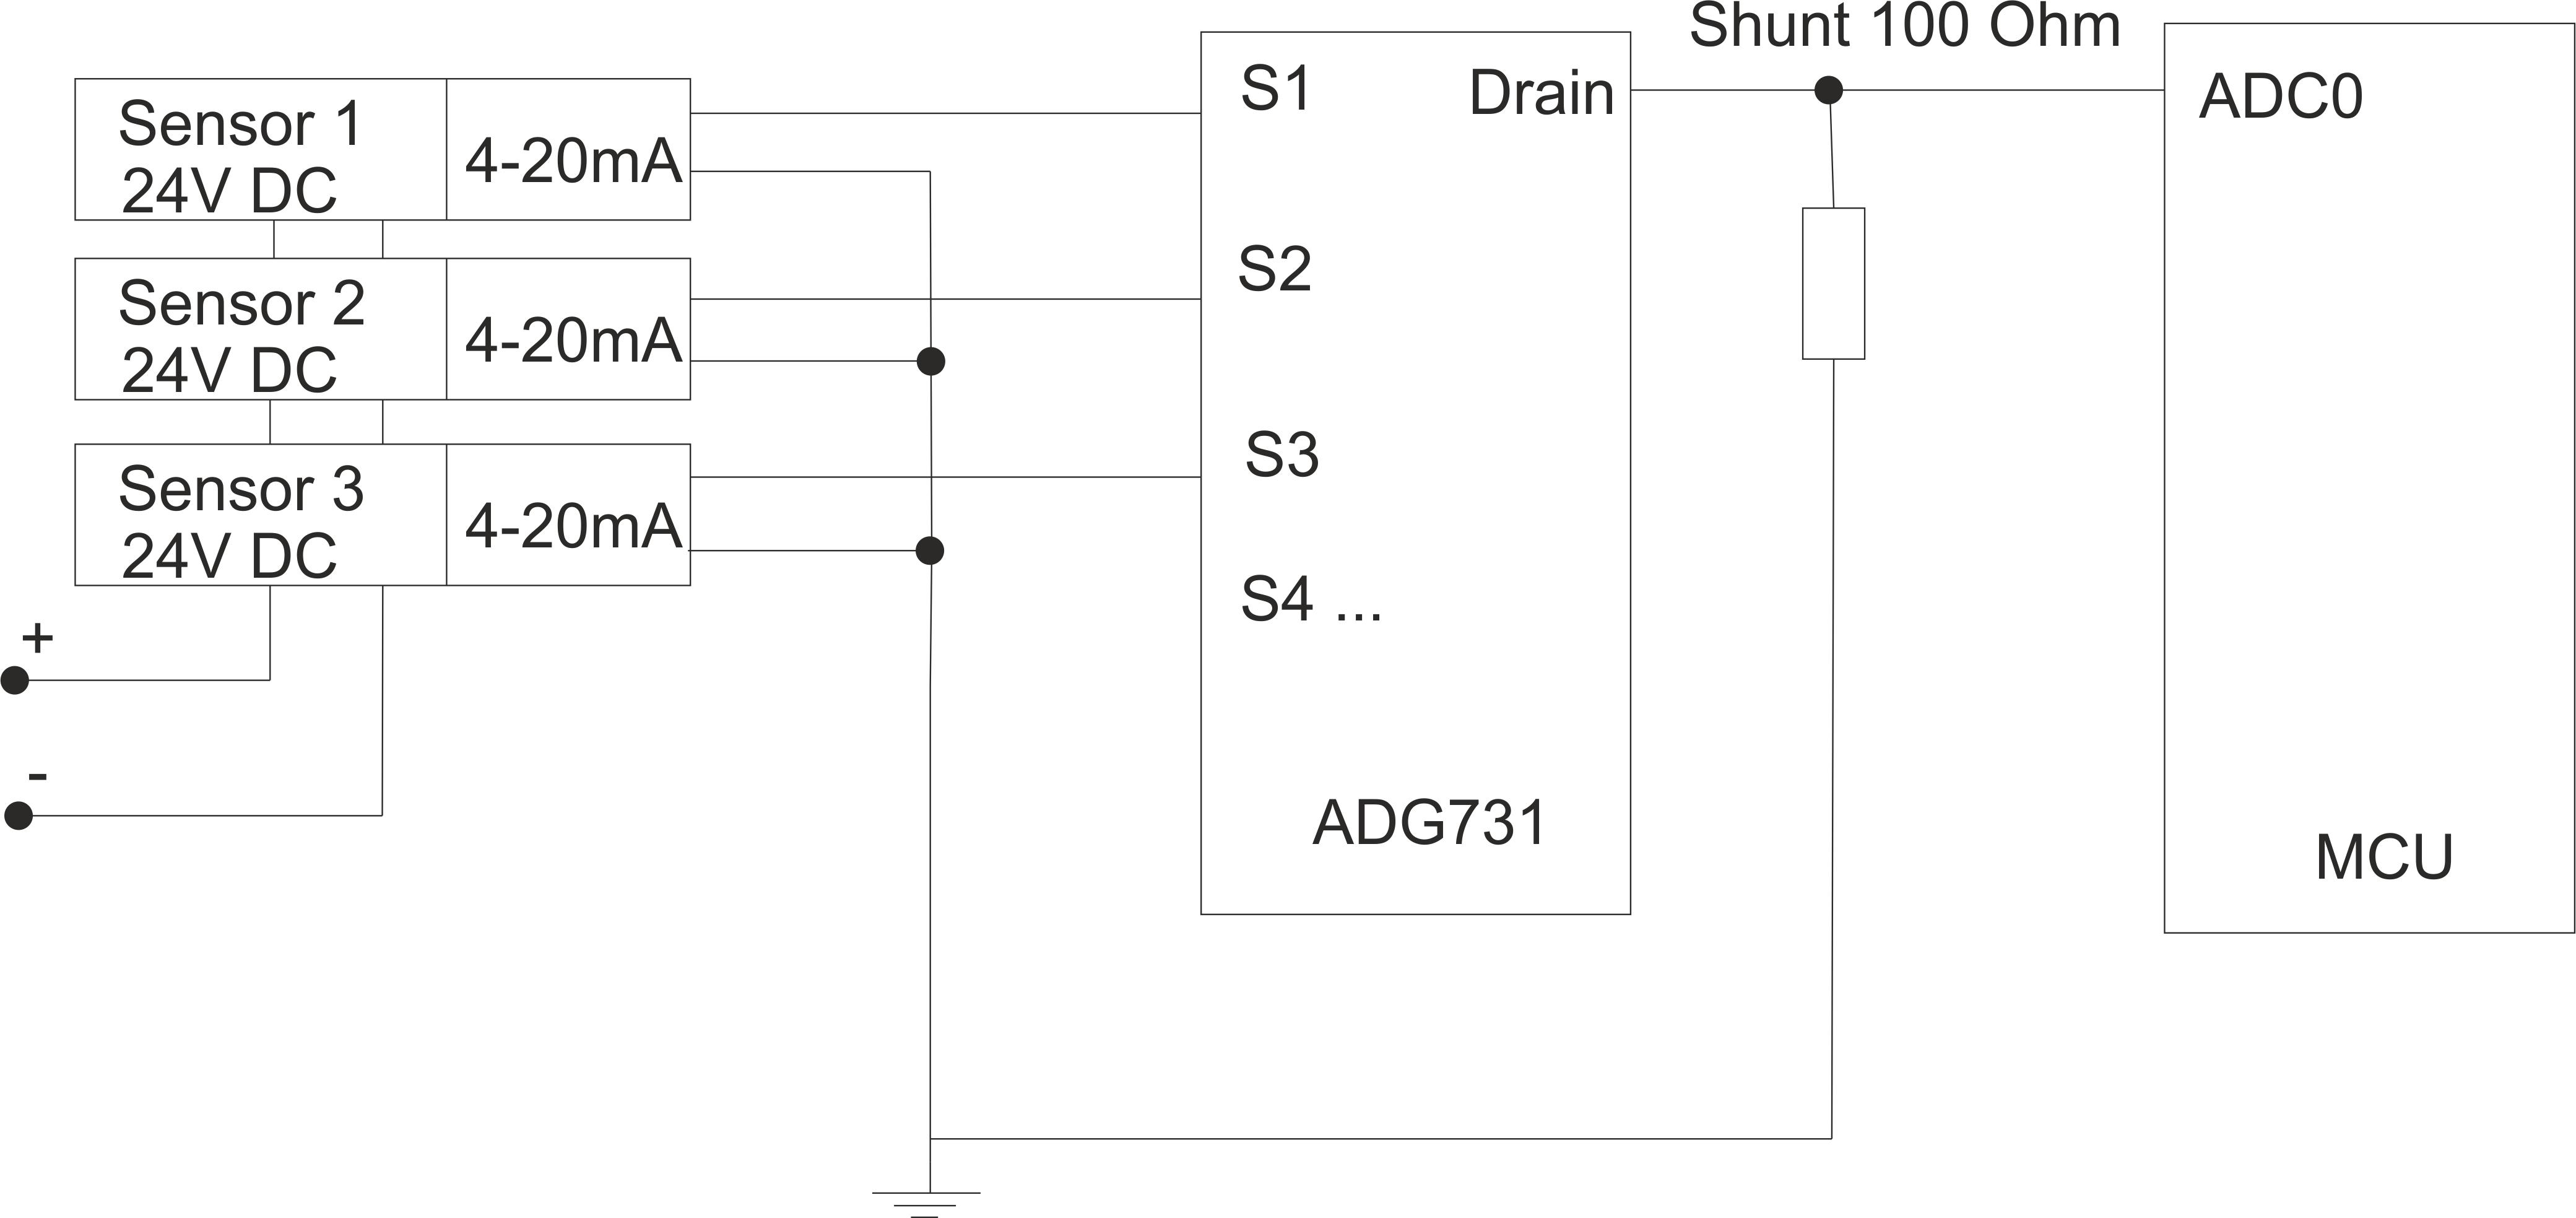 Probleme mit 32-Kanal Analog Multiplexer - Mikrocontroller.net